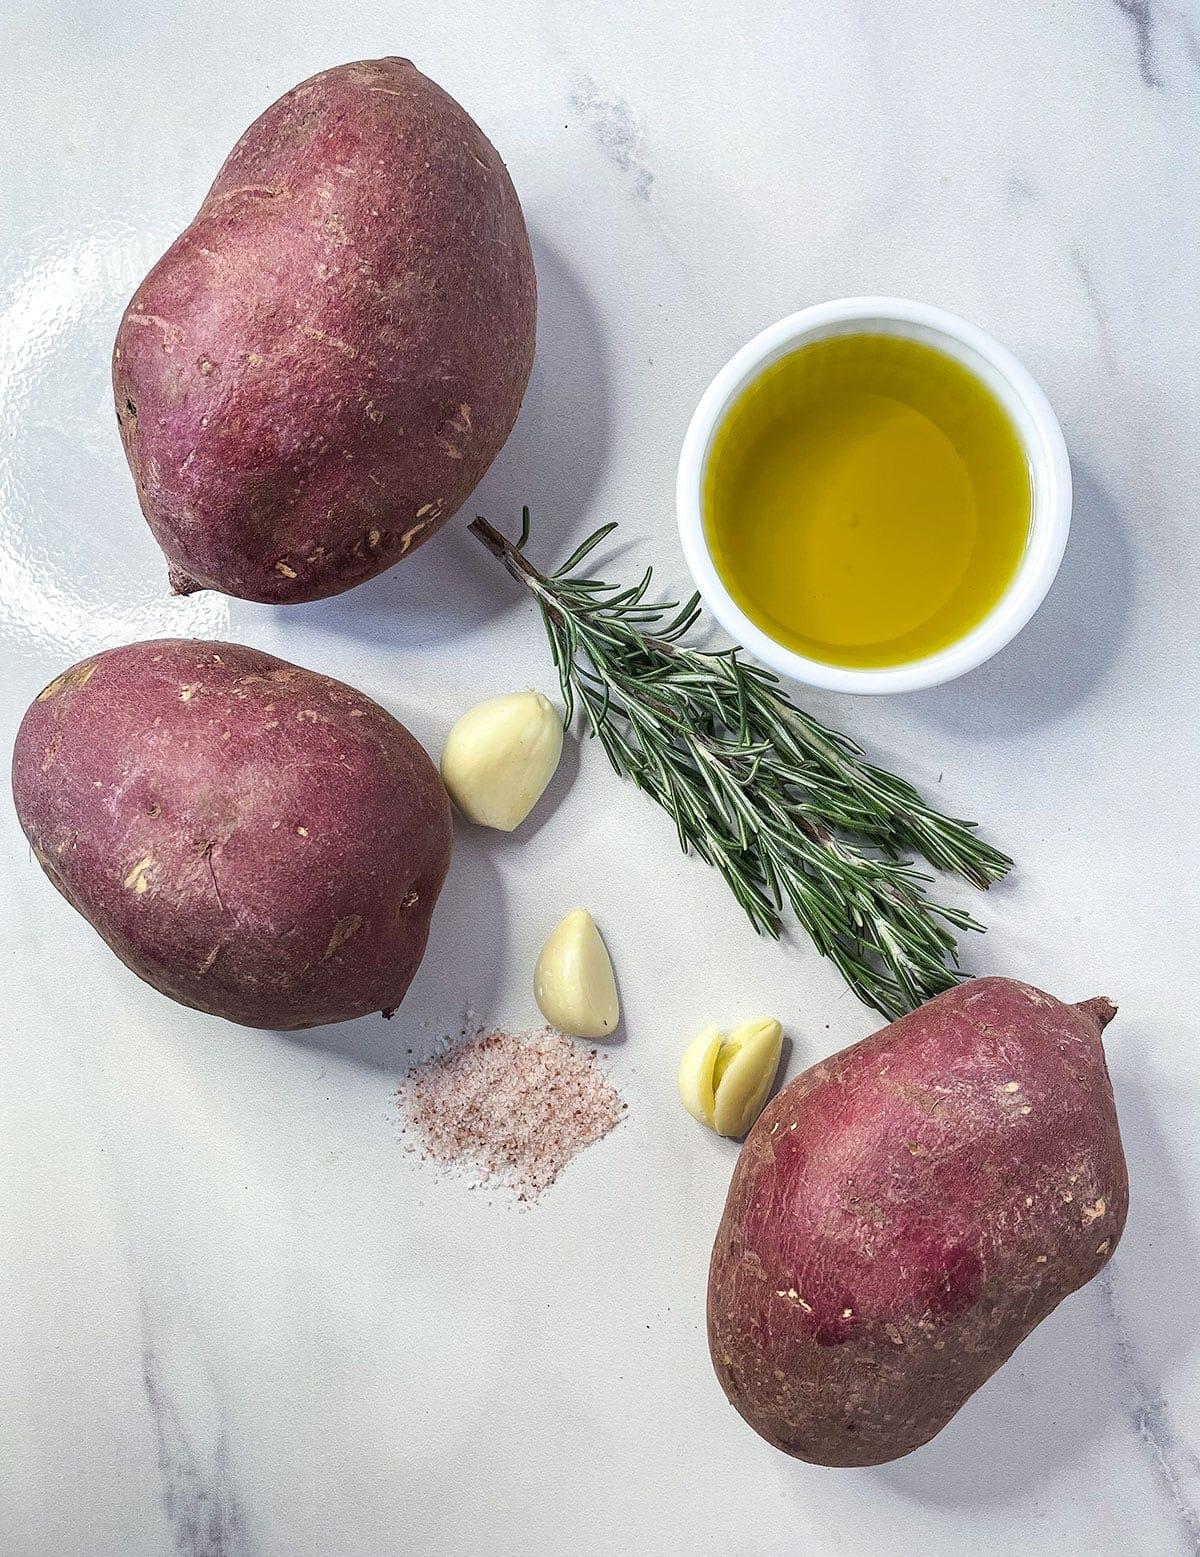 Roasted white sweet potato ingredients on a white background